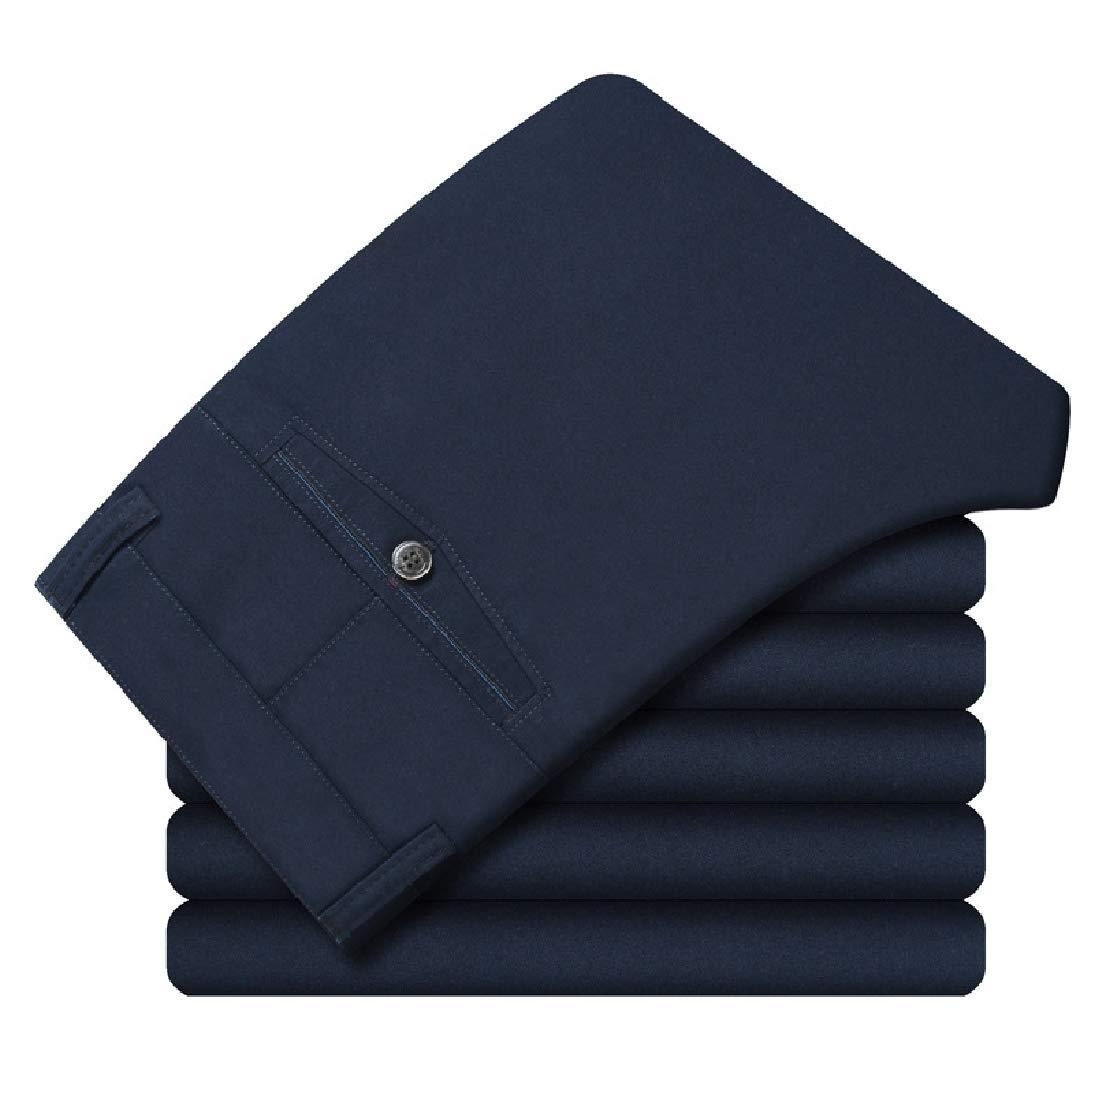 YUNY Mens Hi-Waist Baggy Leisure Straight Chino Pants Trousers 2 S